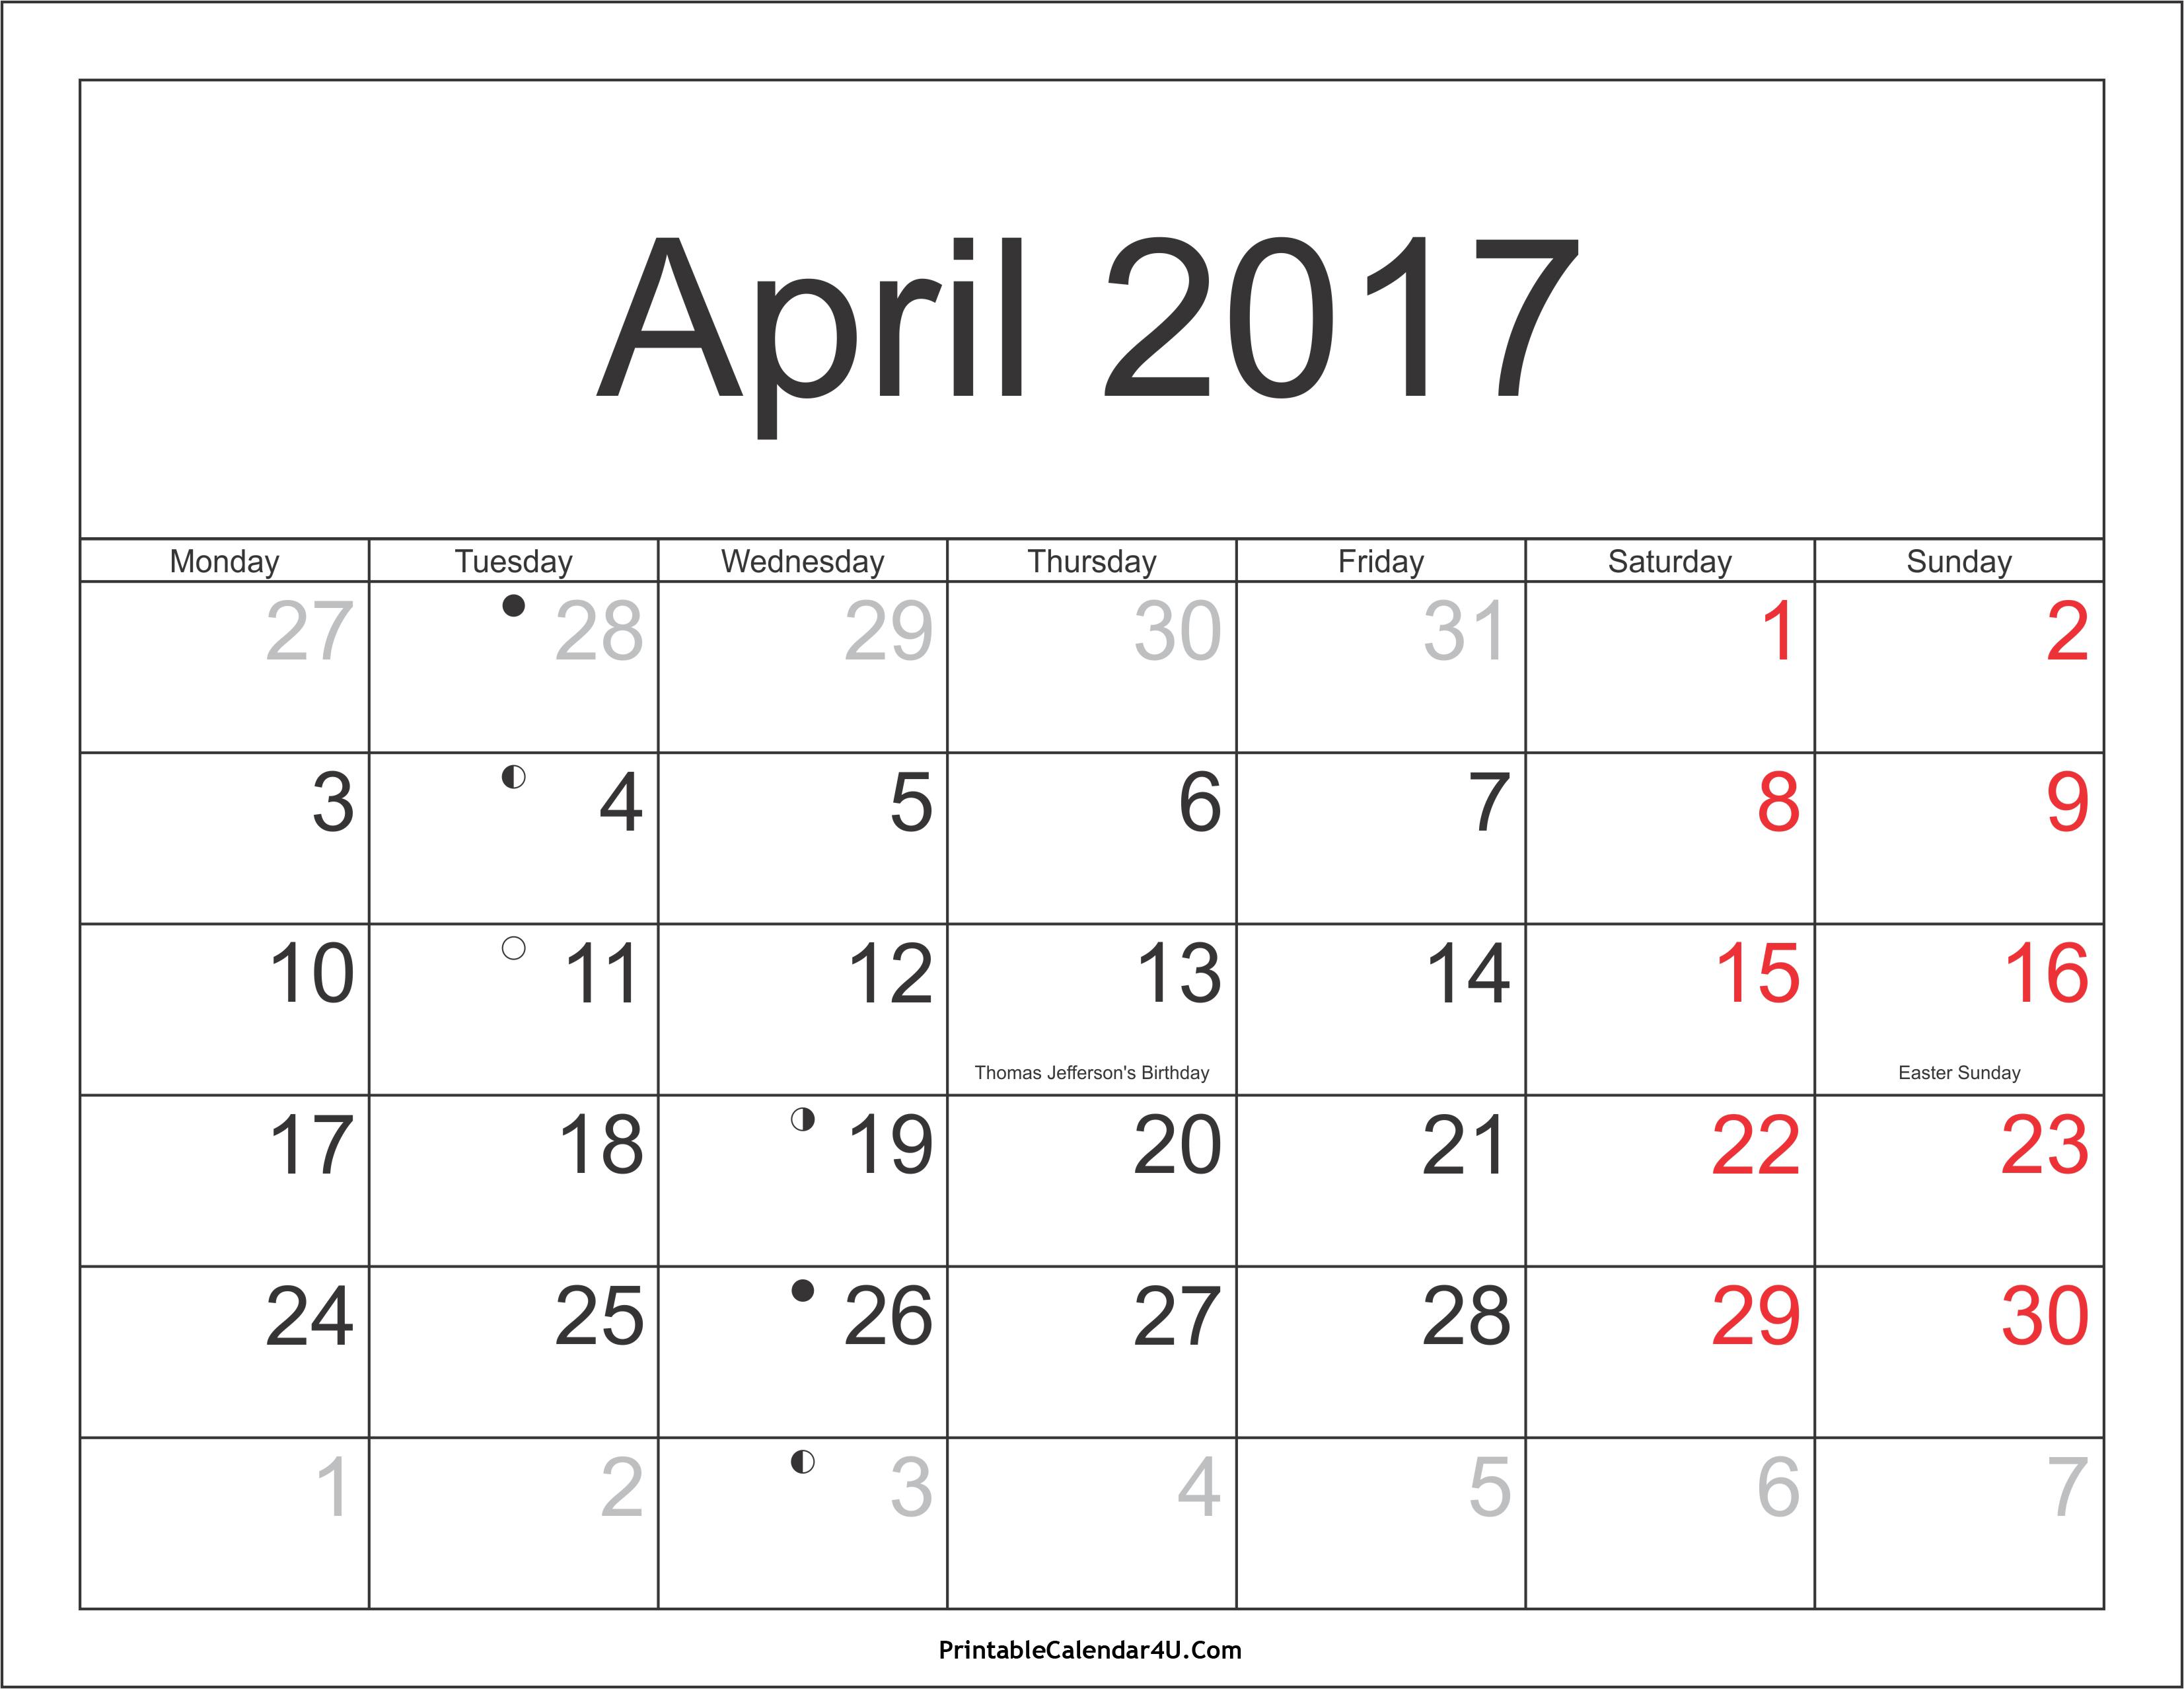 April 2017 Calendar With Holidays | weekly calendar template